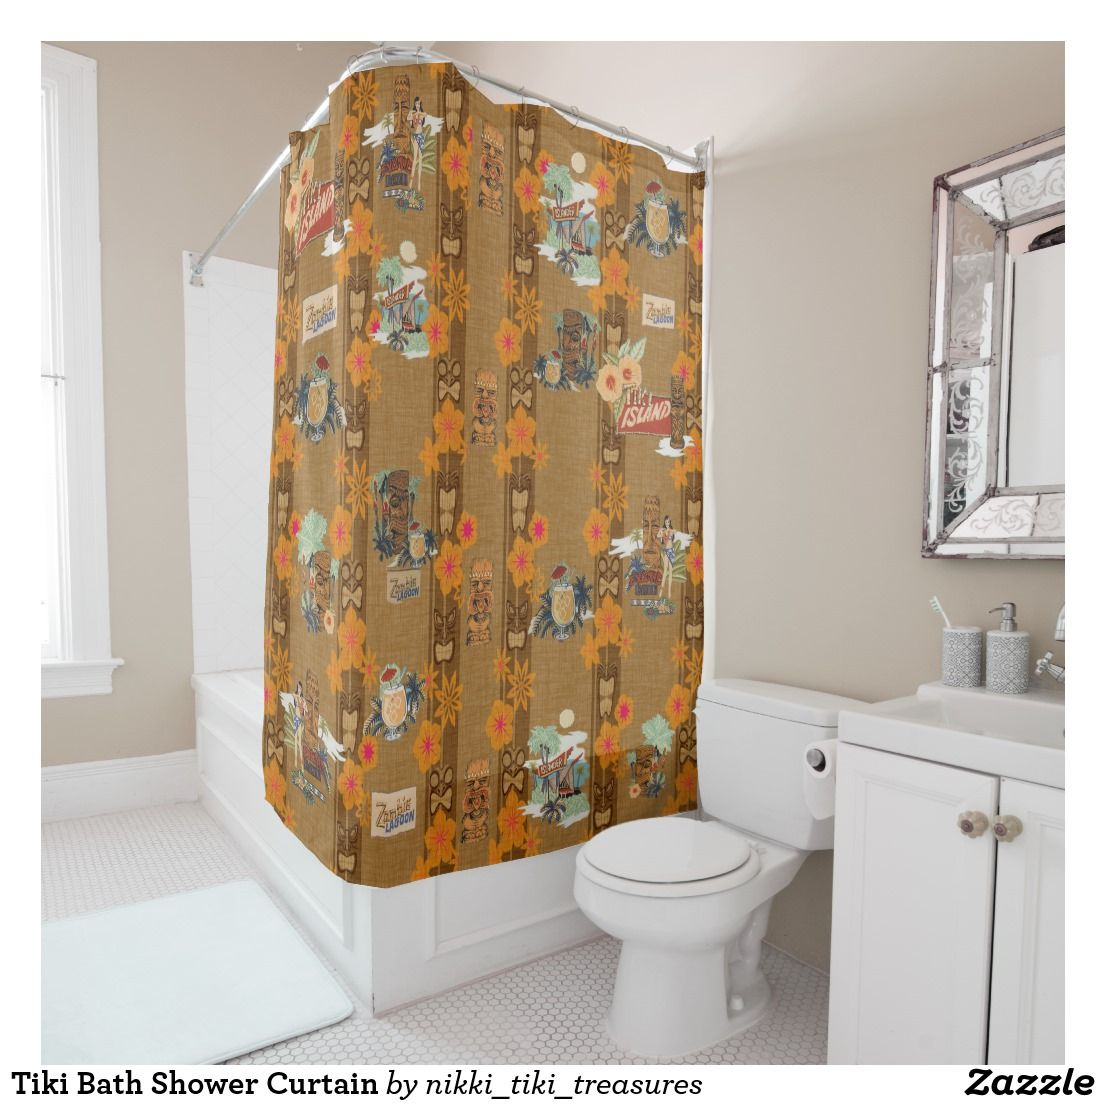 Tiki Bath Shower Curtain Zazzle